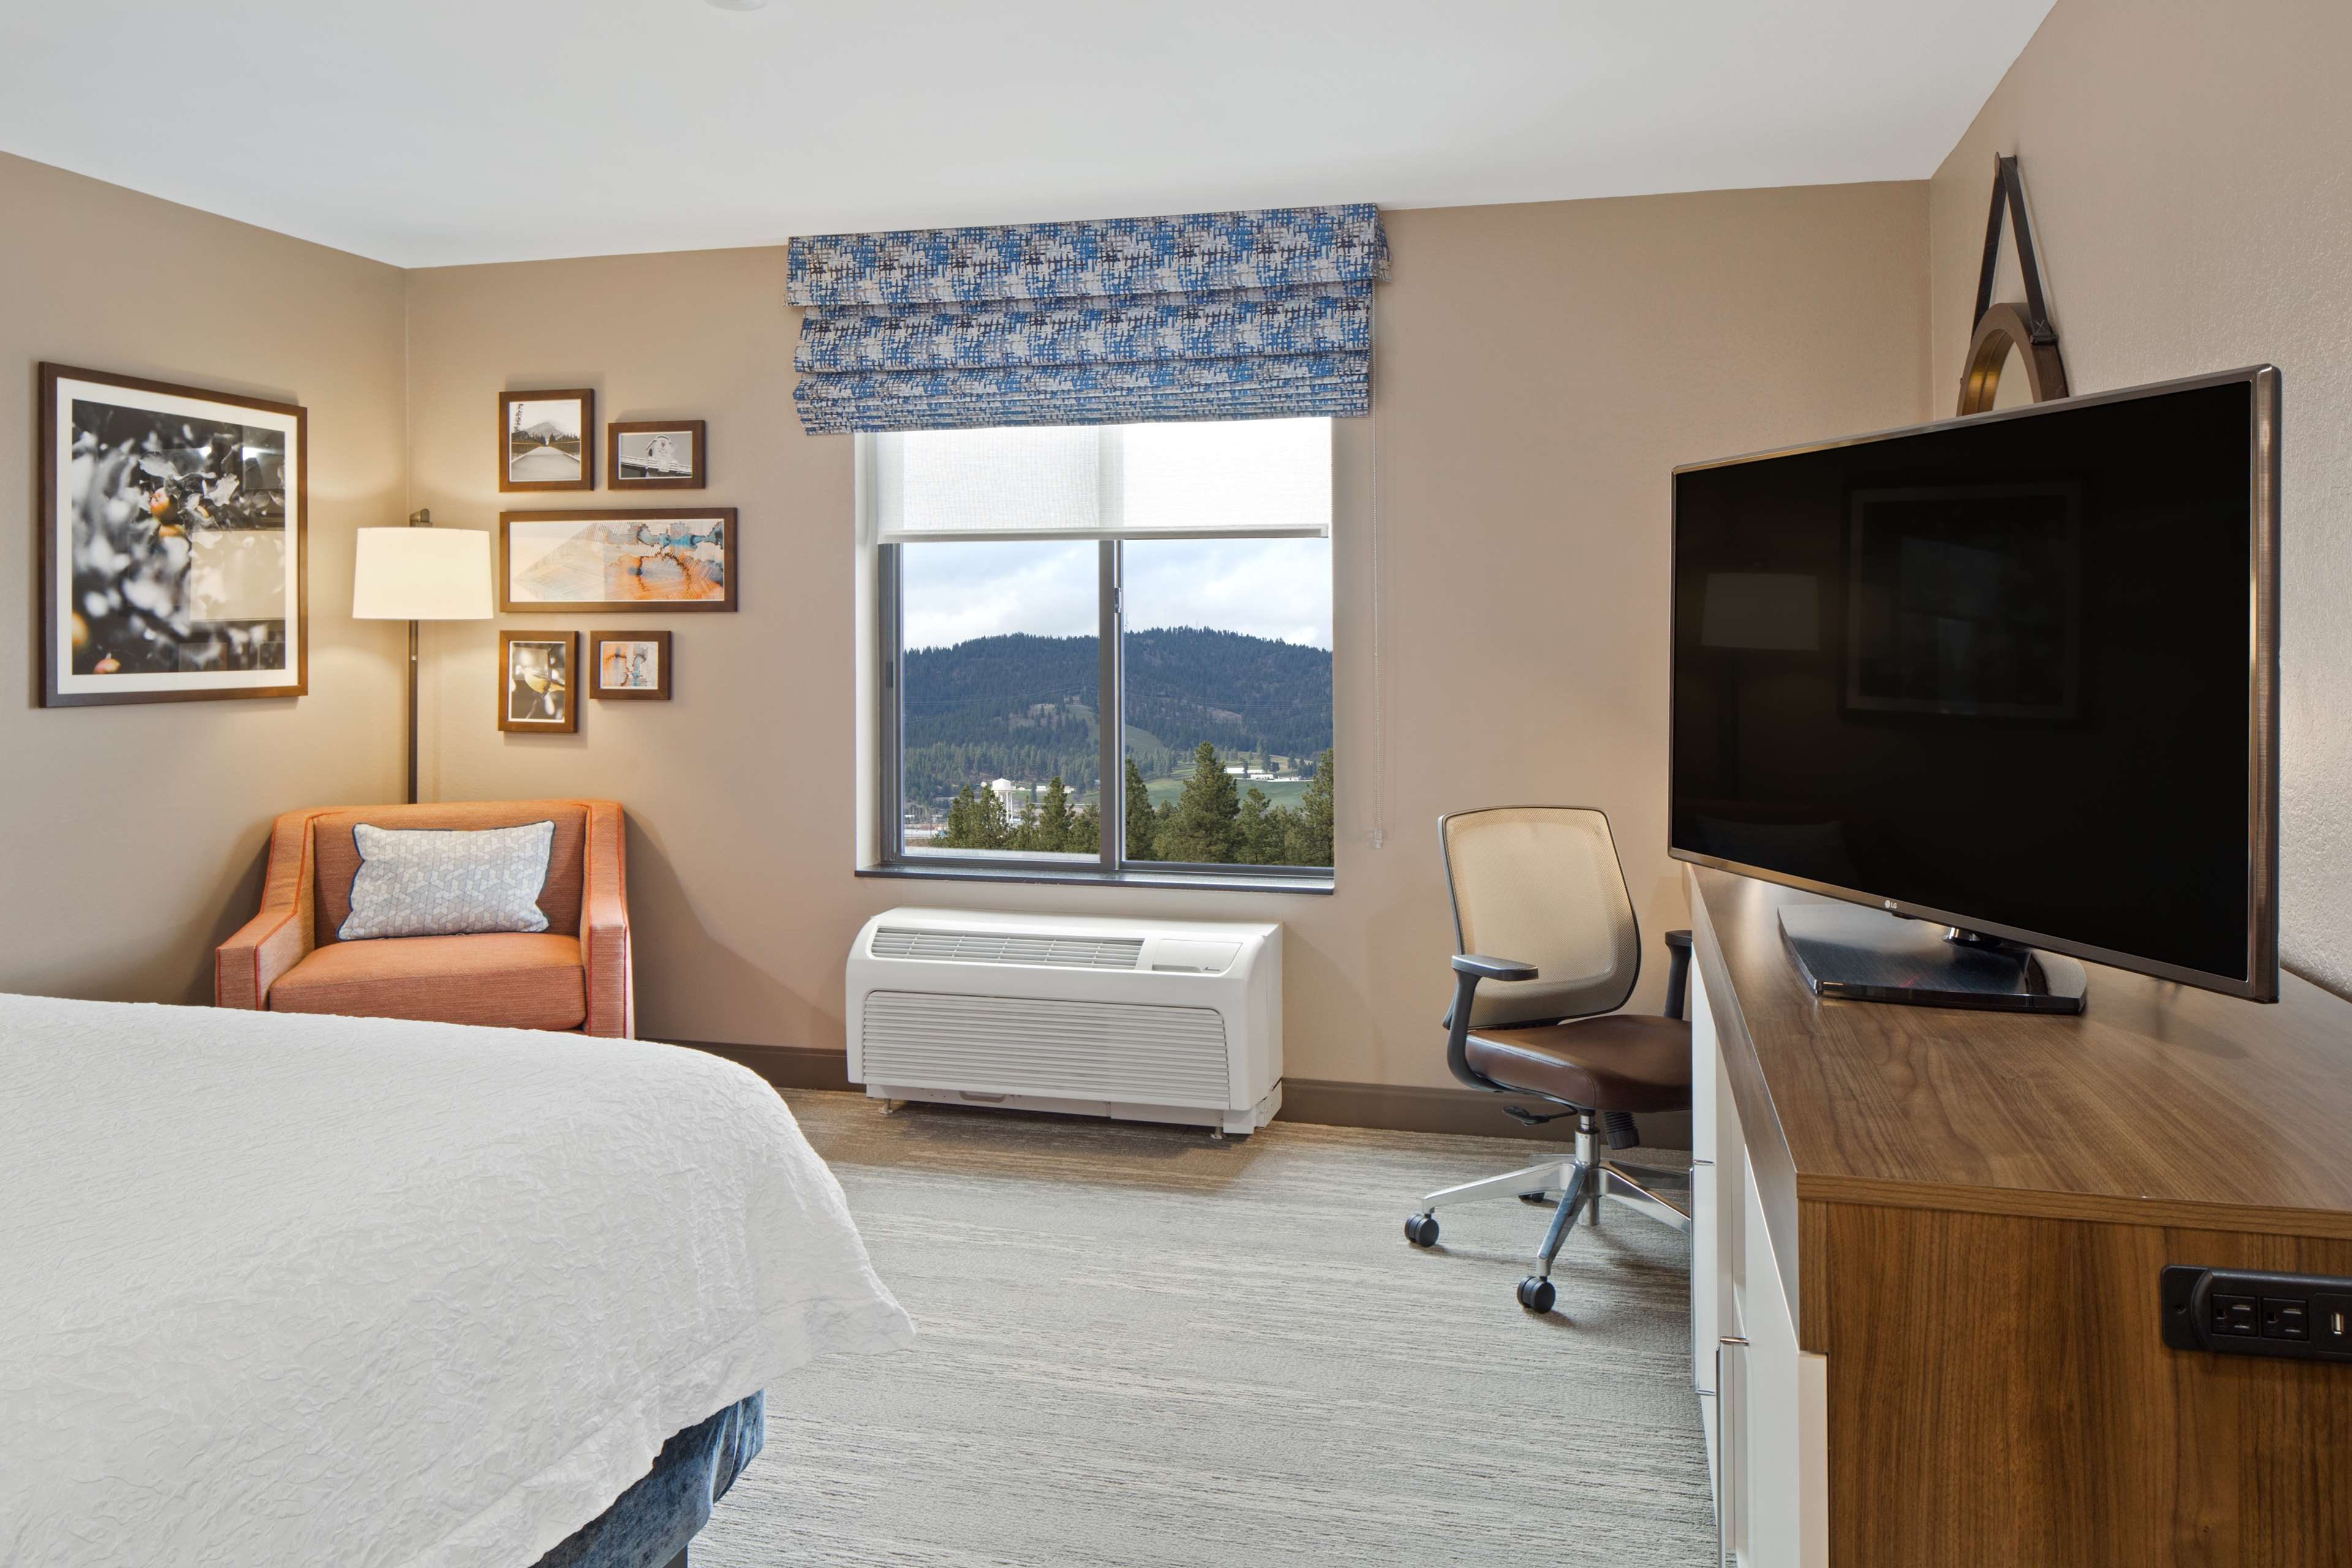 Hampton Inn & Suites Spokane Valley image 26